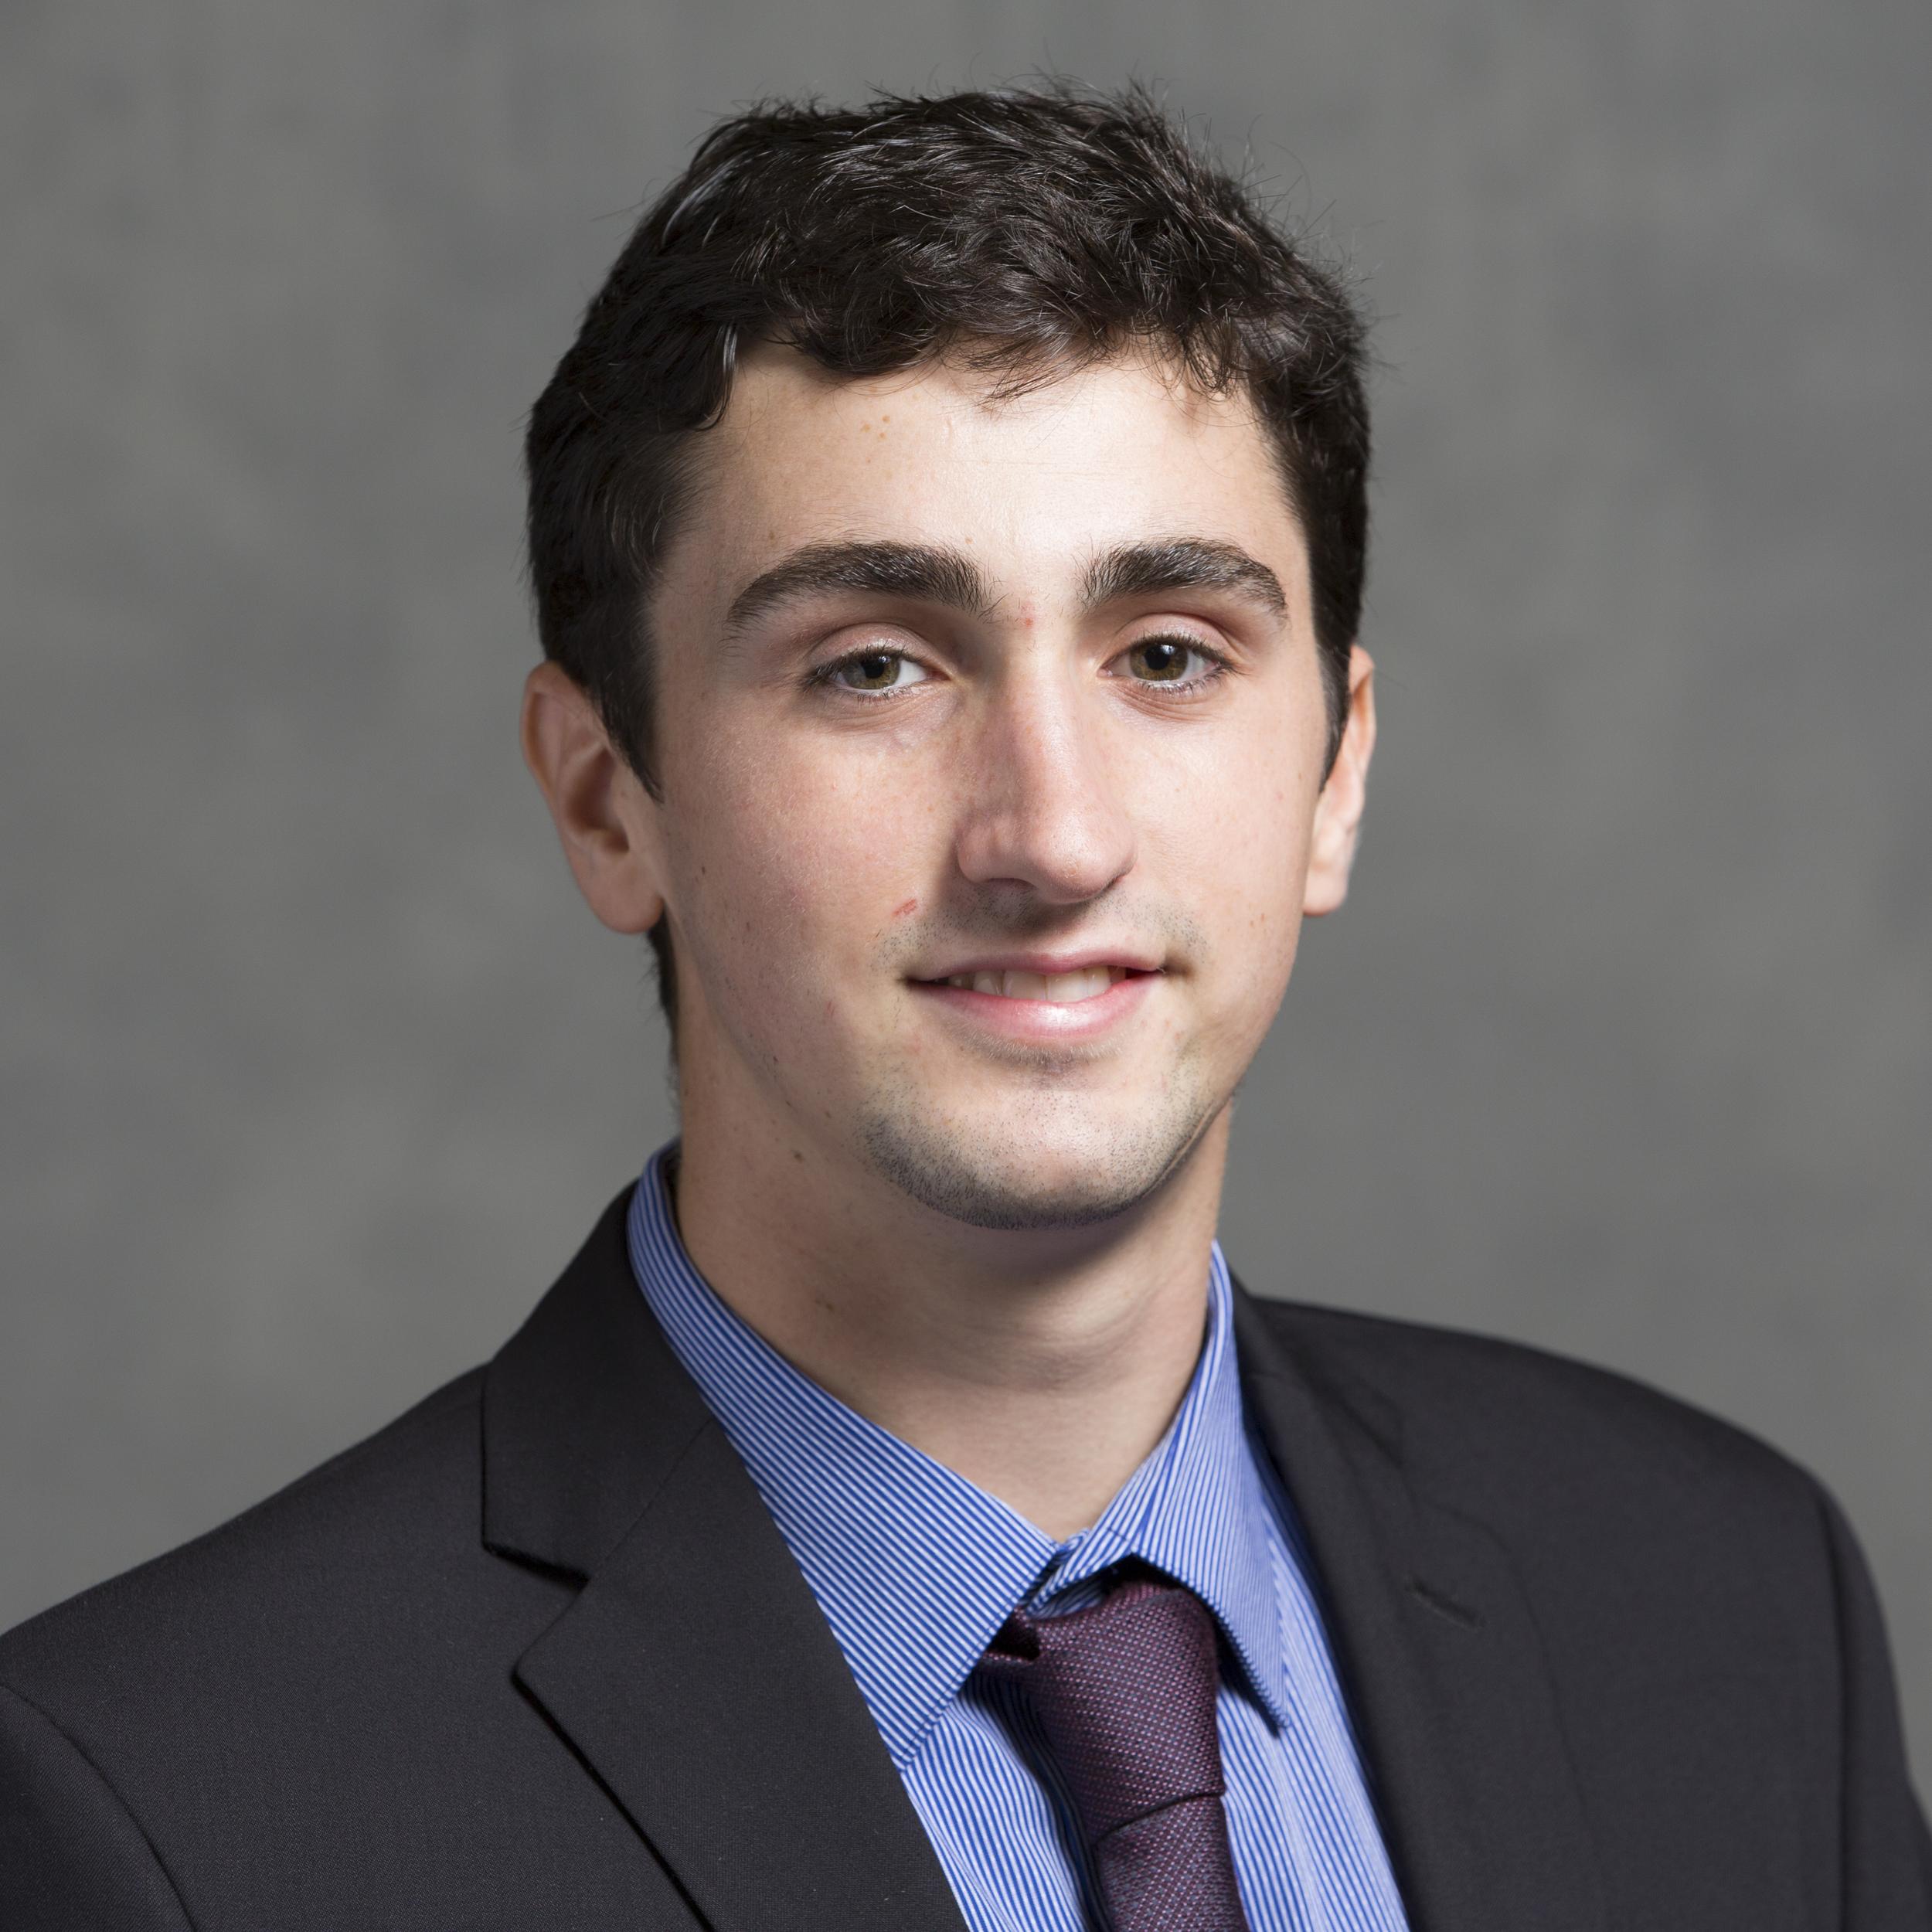 09/30/2015 - Medford/Somerville, Mass. - Career Services Linkedin headshot at the career fair on September 29, 2015. (Evan Sayles for Tufts University)